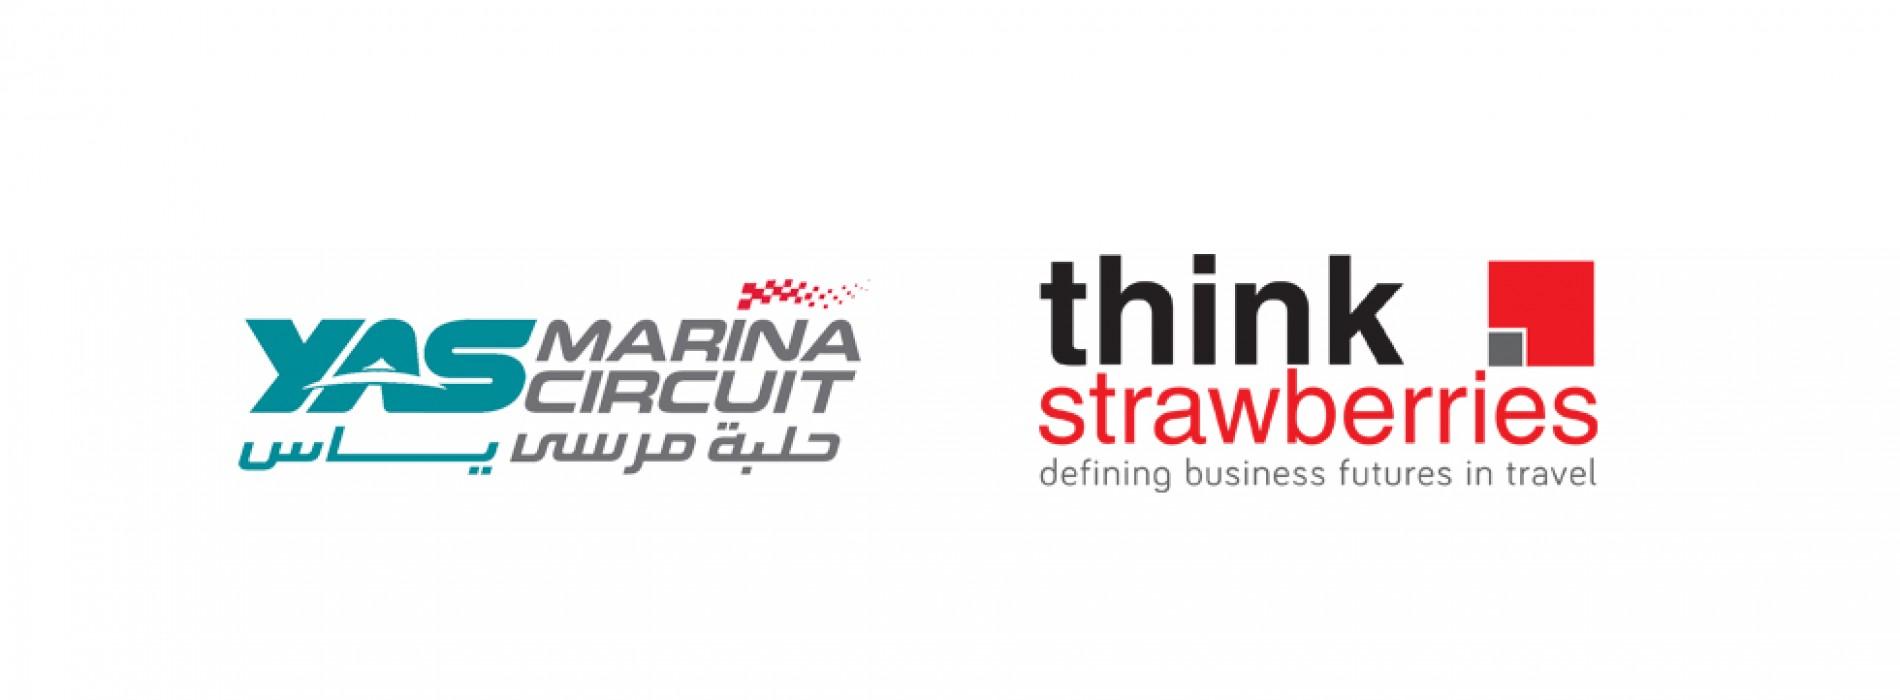 Think Strawberries partners with Yas Marina Circuit – Abu Dhabi